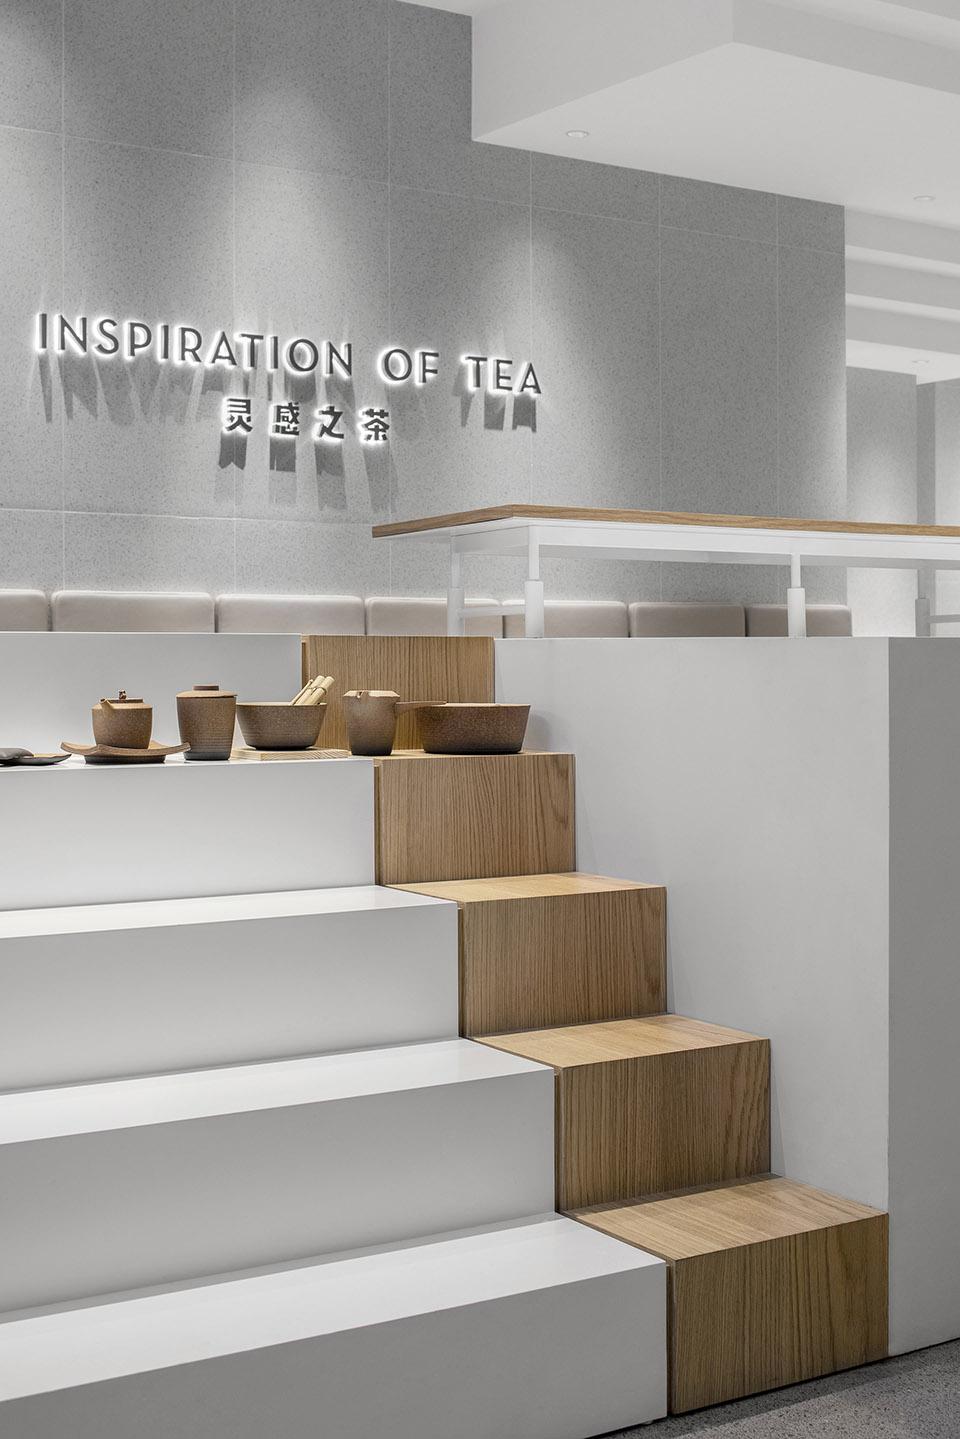 011-heytea-at-one-avenue-shenzhen-china-by-moc-design-office.jpg